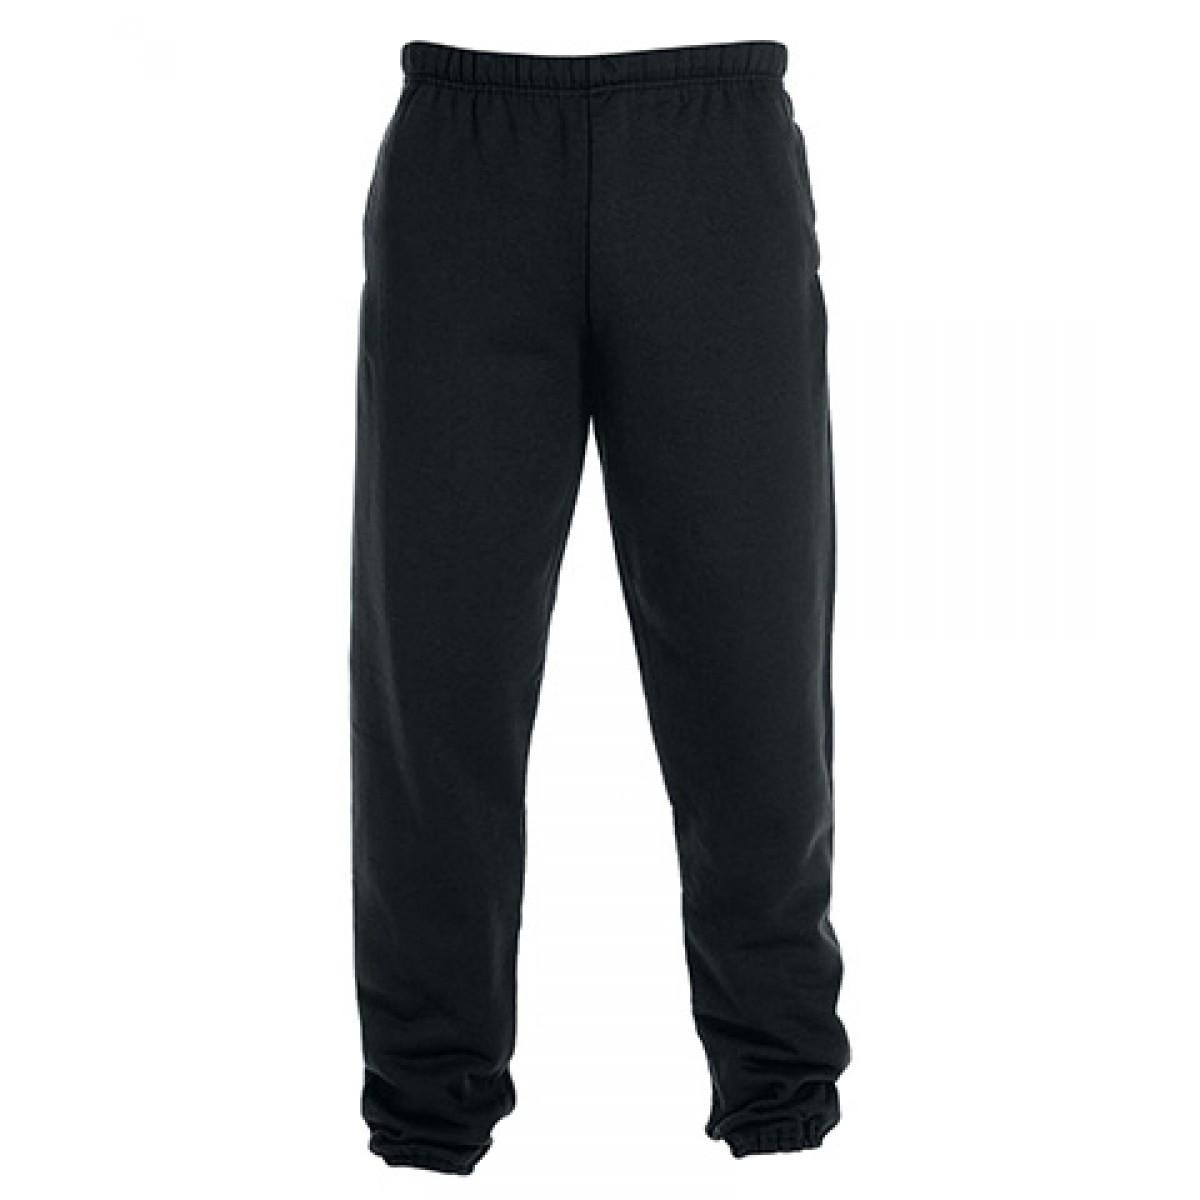 Fleece Pocketed Sweatpants-Black-YM